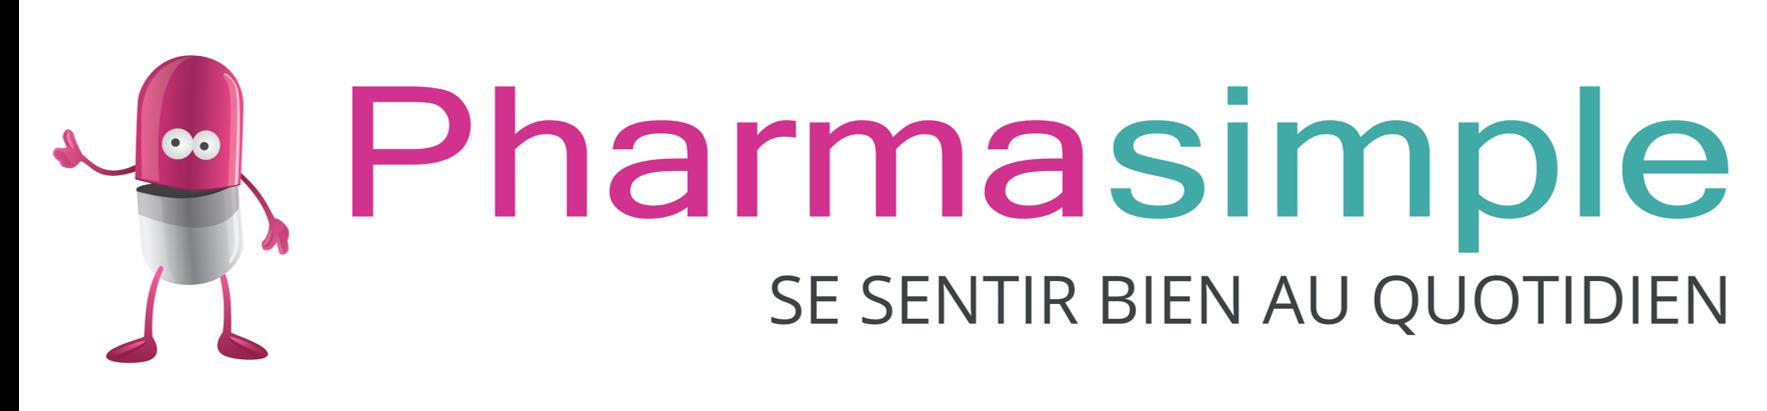 PHARMASIMPLE